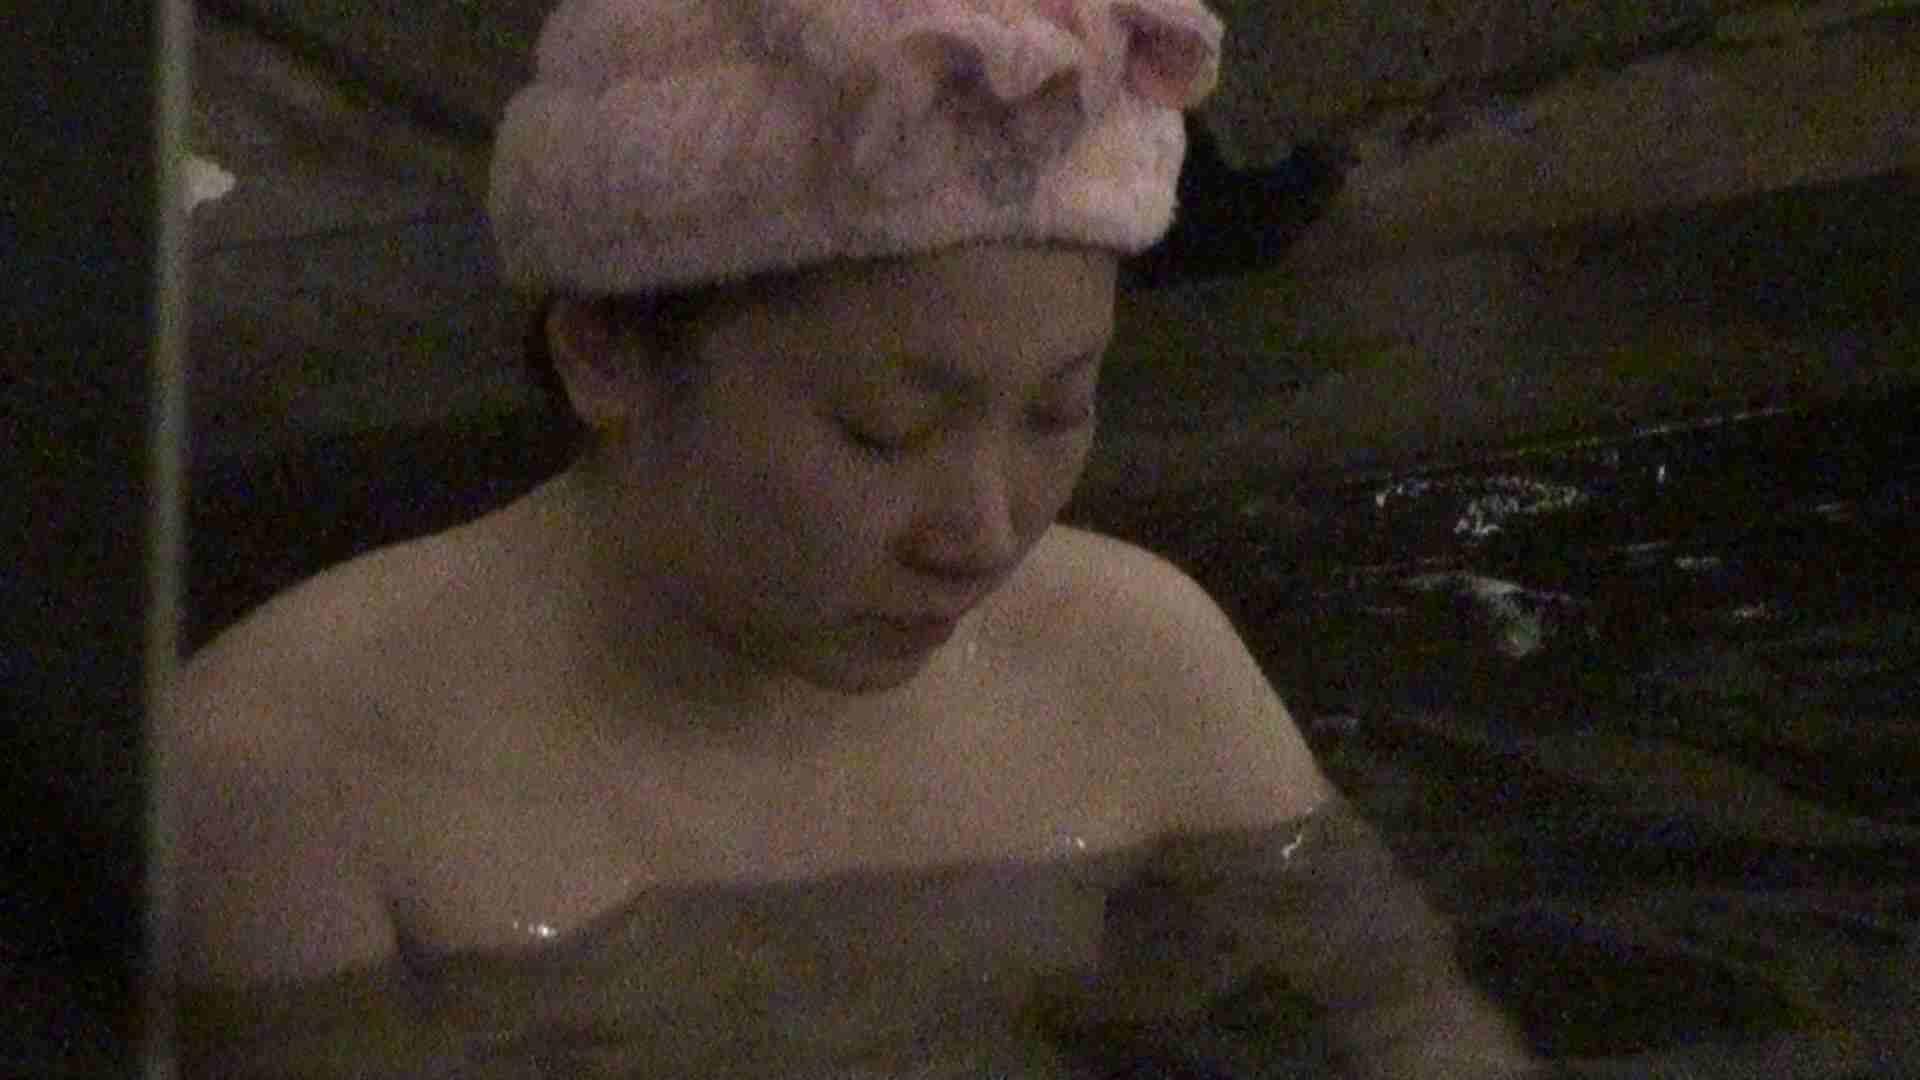 Aquaな露天風呂Vol.341 盗撮特撮  10pic 3